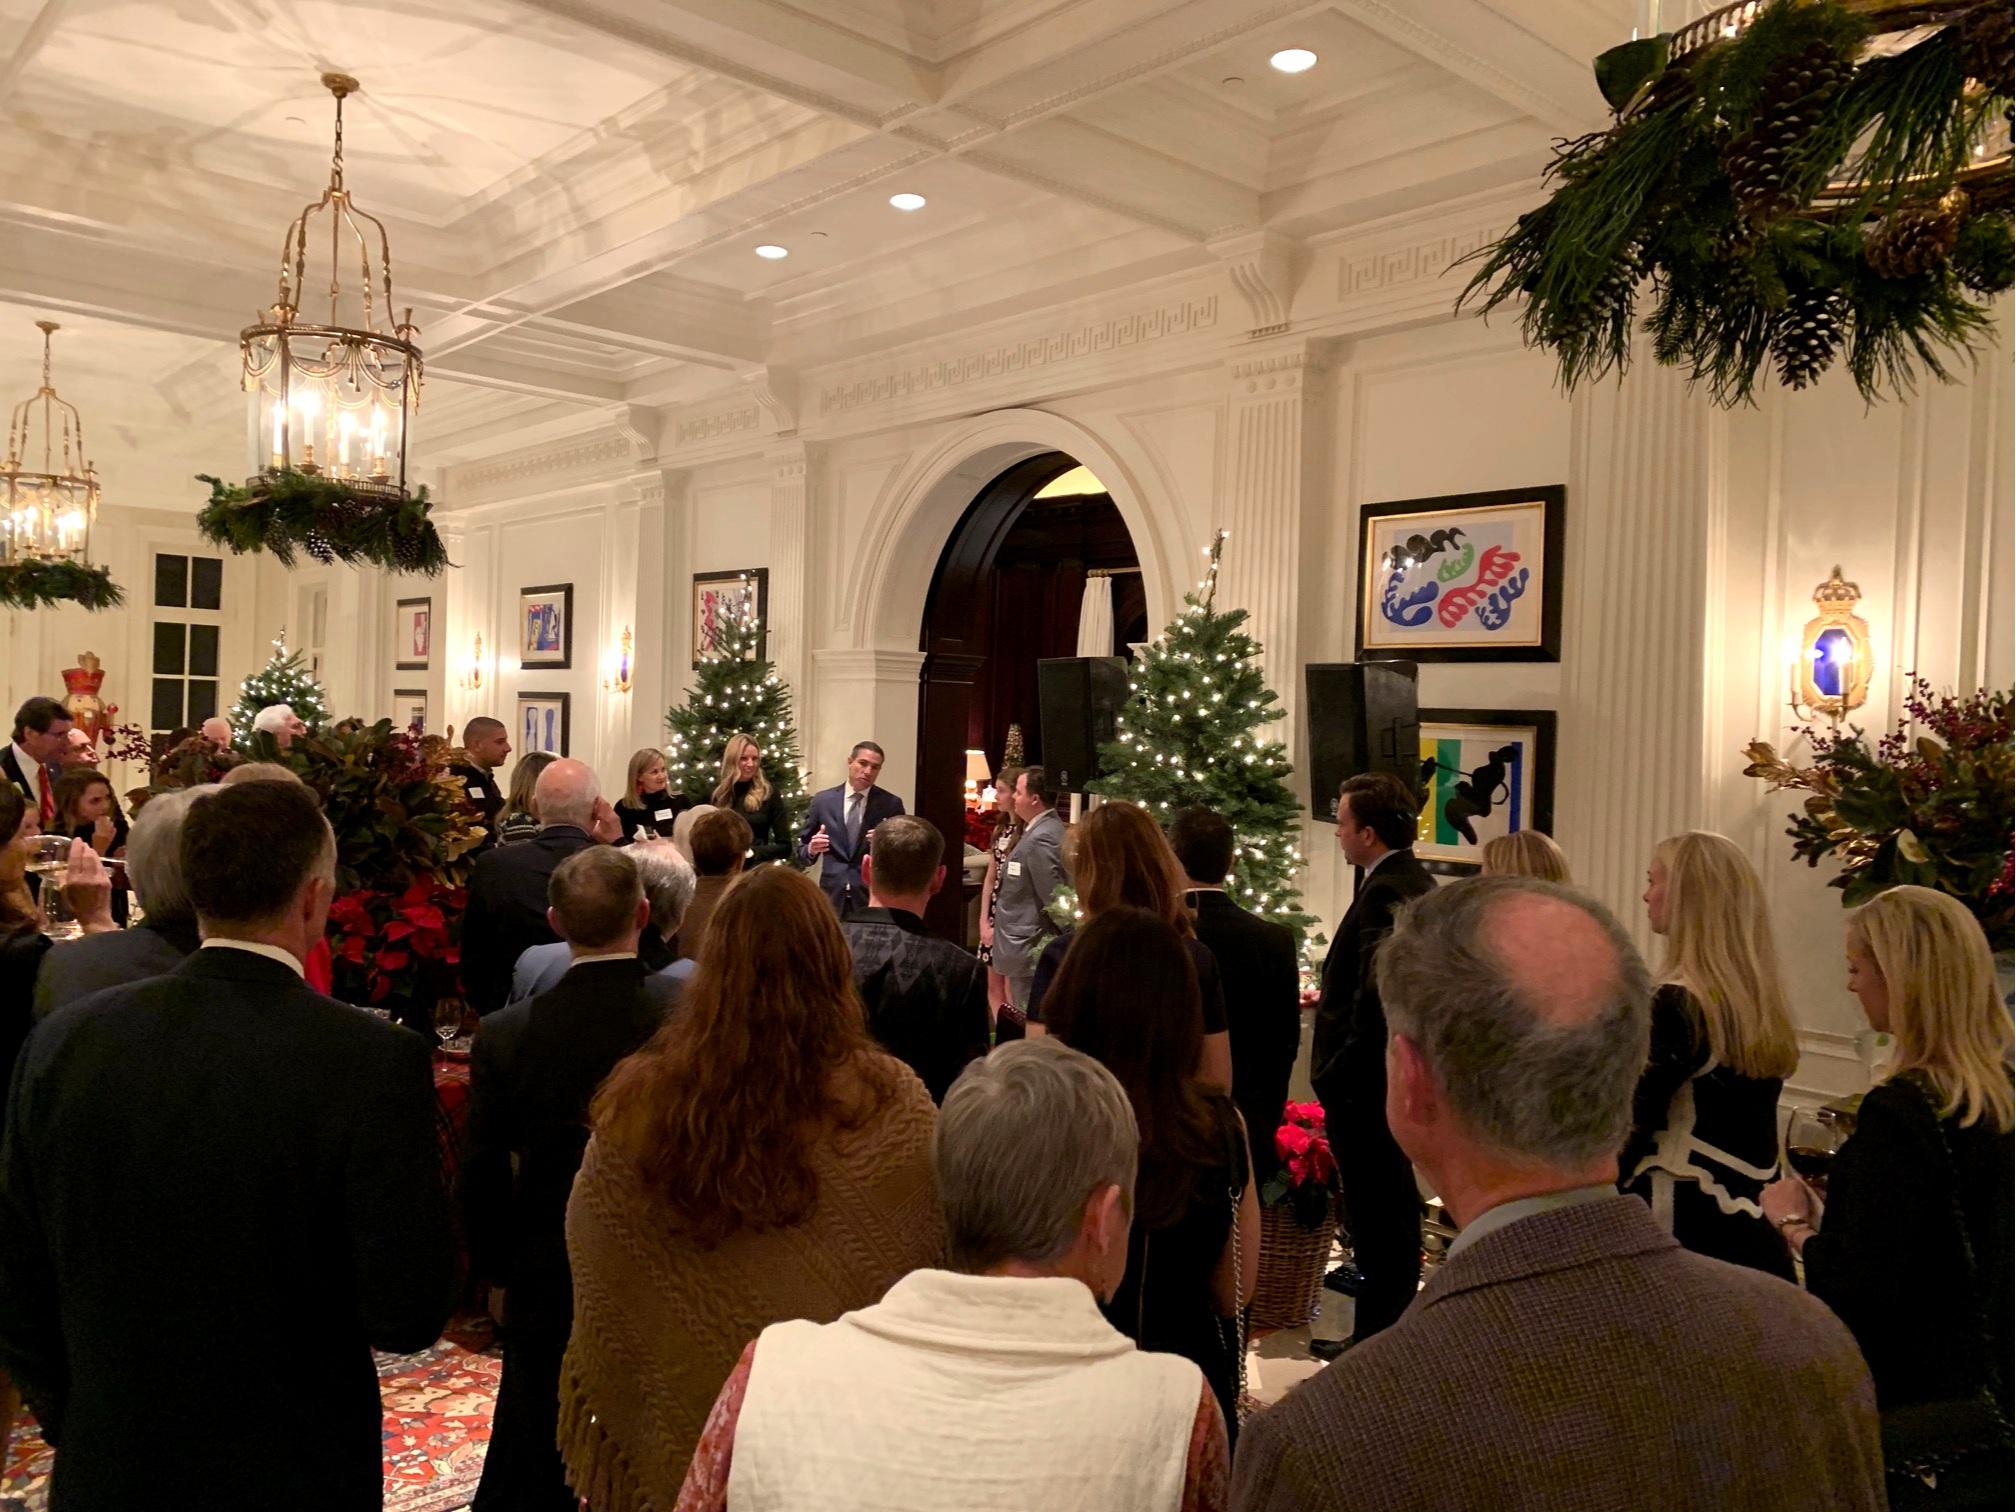 Texas State Representative Morgan Meyer's annual holiday reception in Dallas on December 6, 2018.